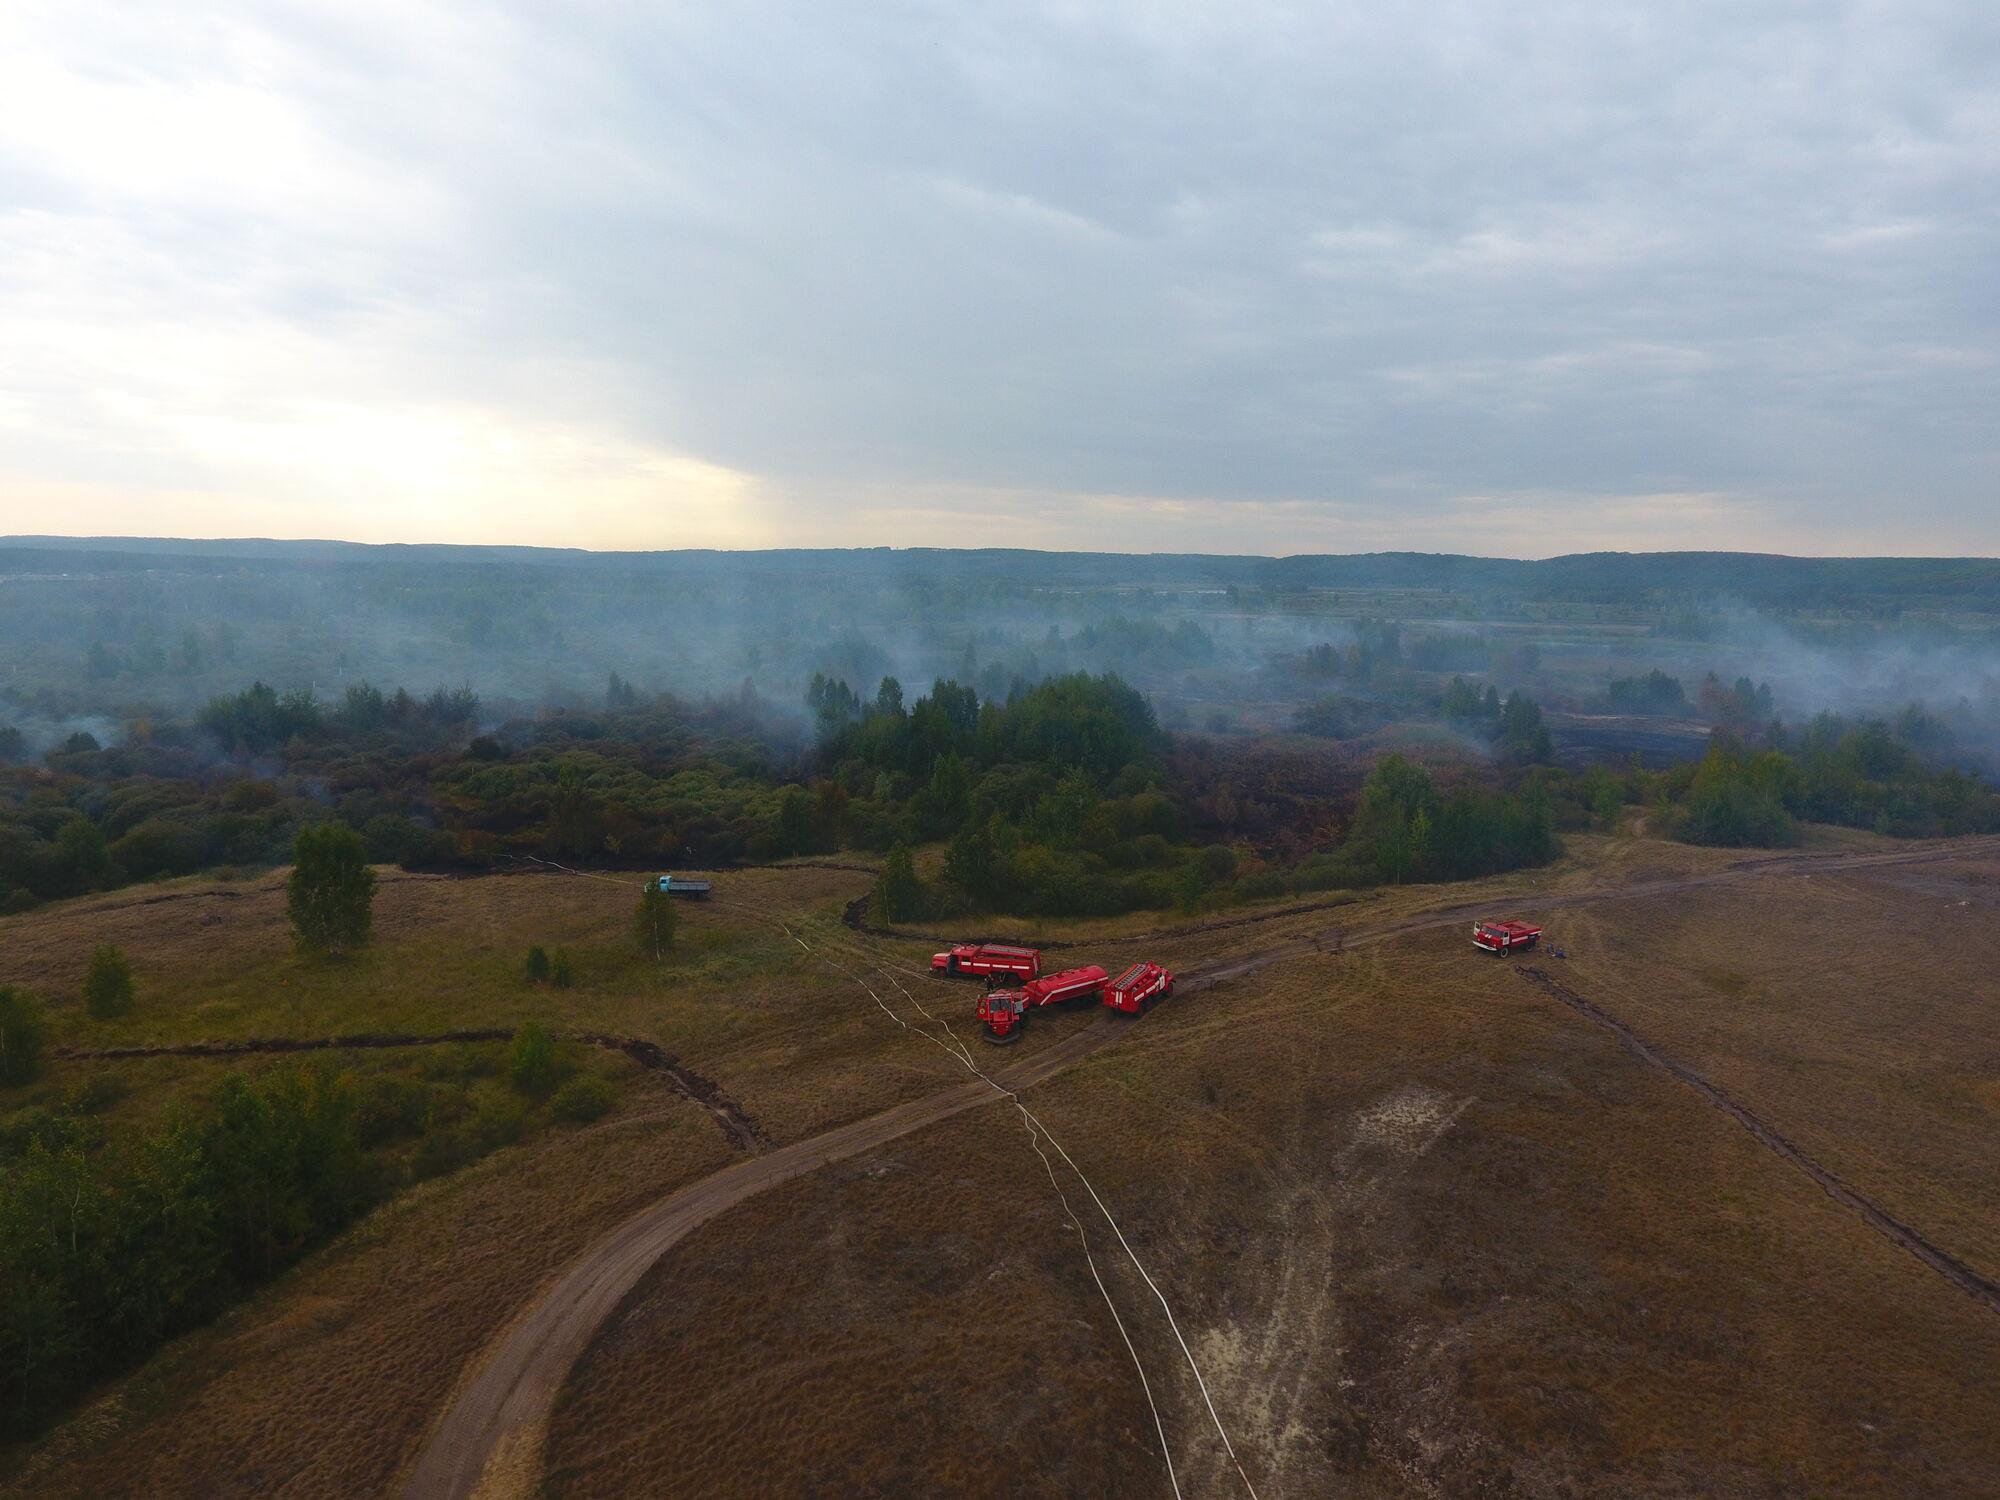 Под Черкассами полыхает масштабный пожар: объявлена чрезвычайная ситуация